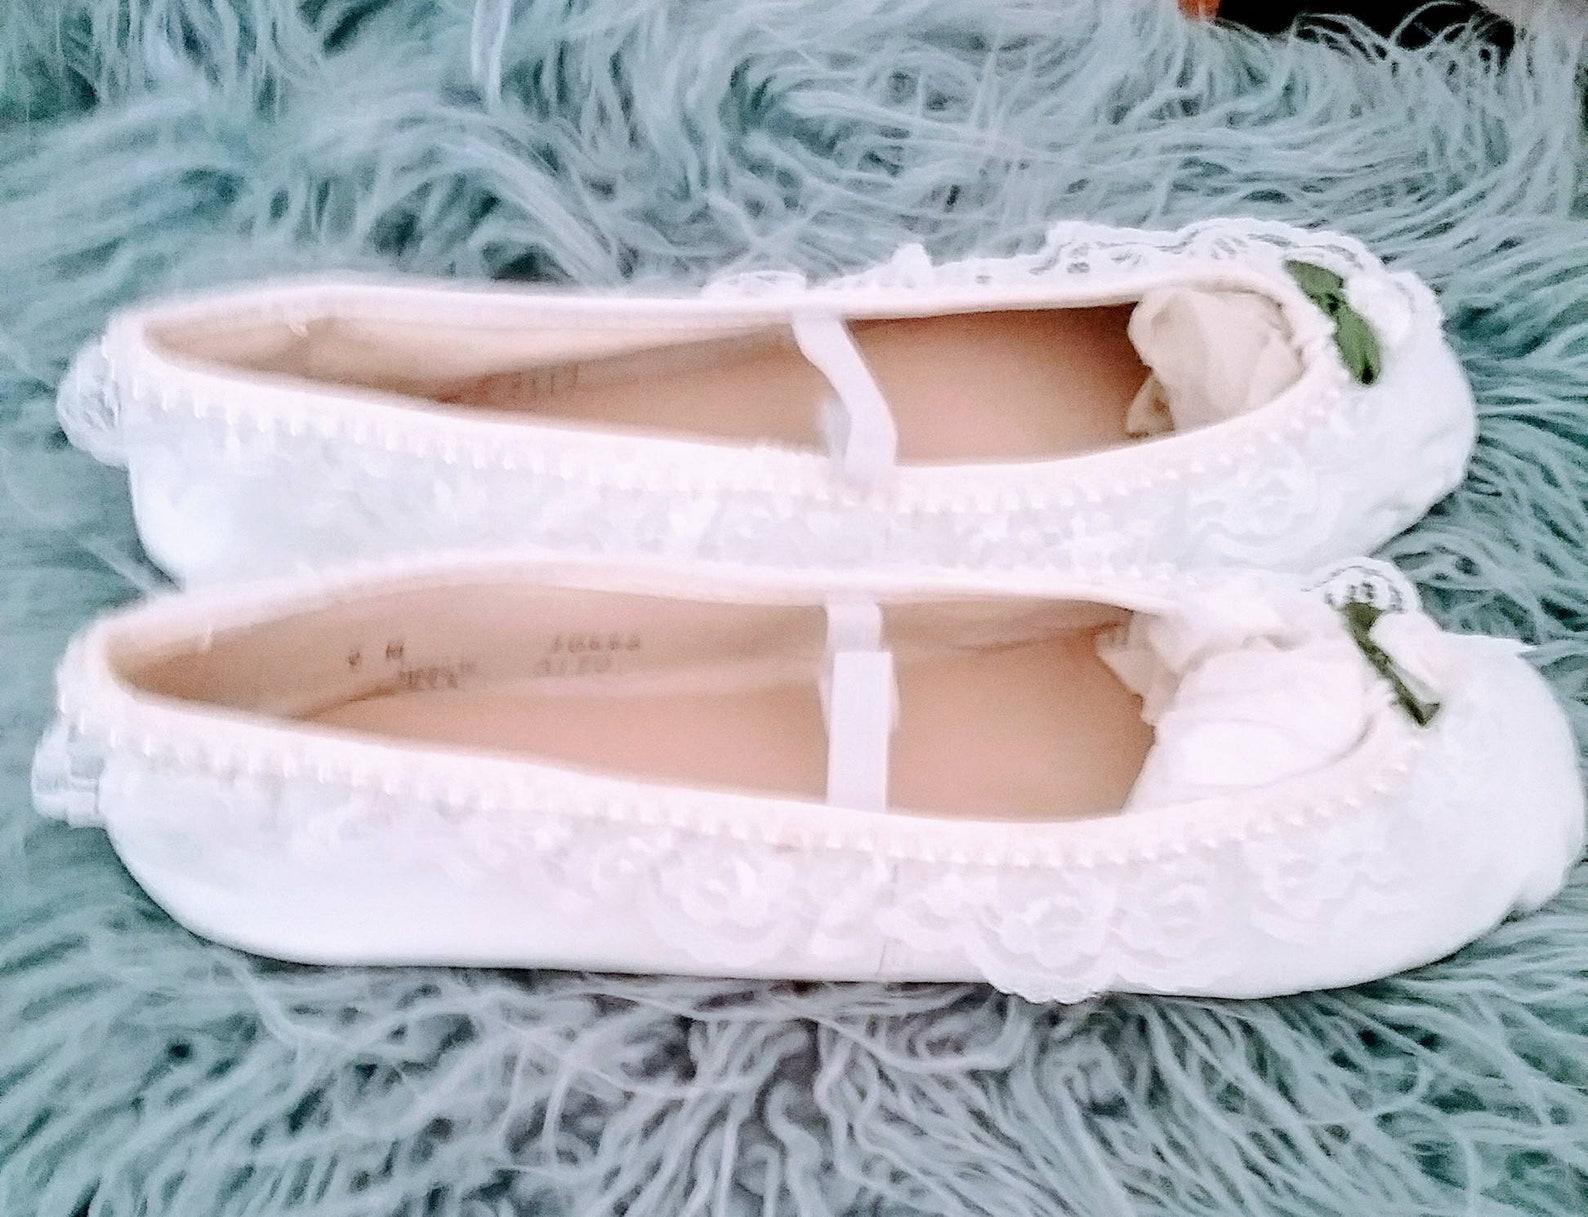 st demilo design white leather ballet slippers pearl, lace floret trim size 9 new unworn